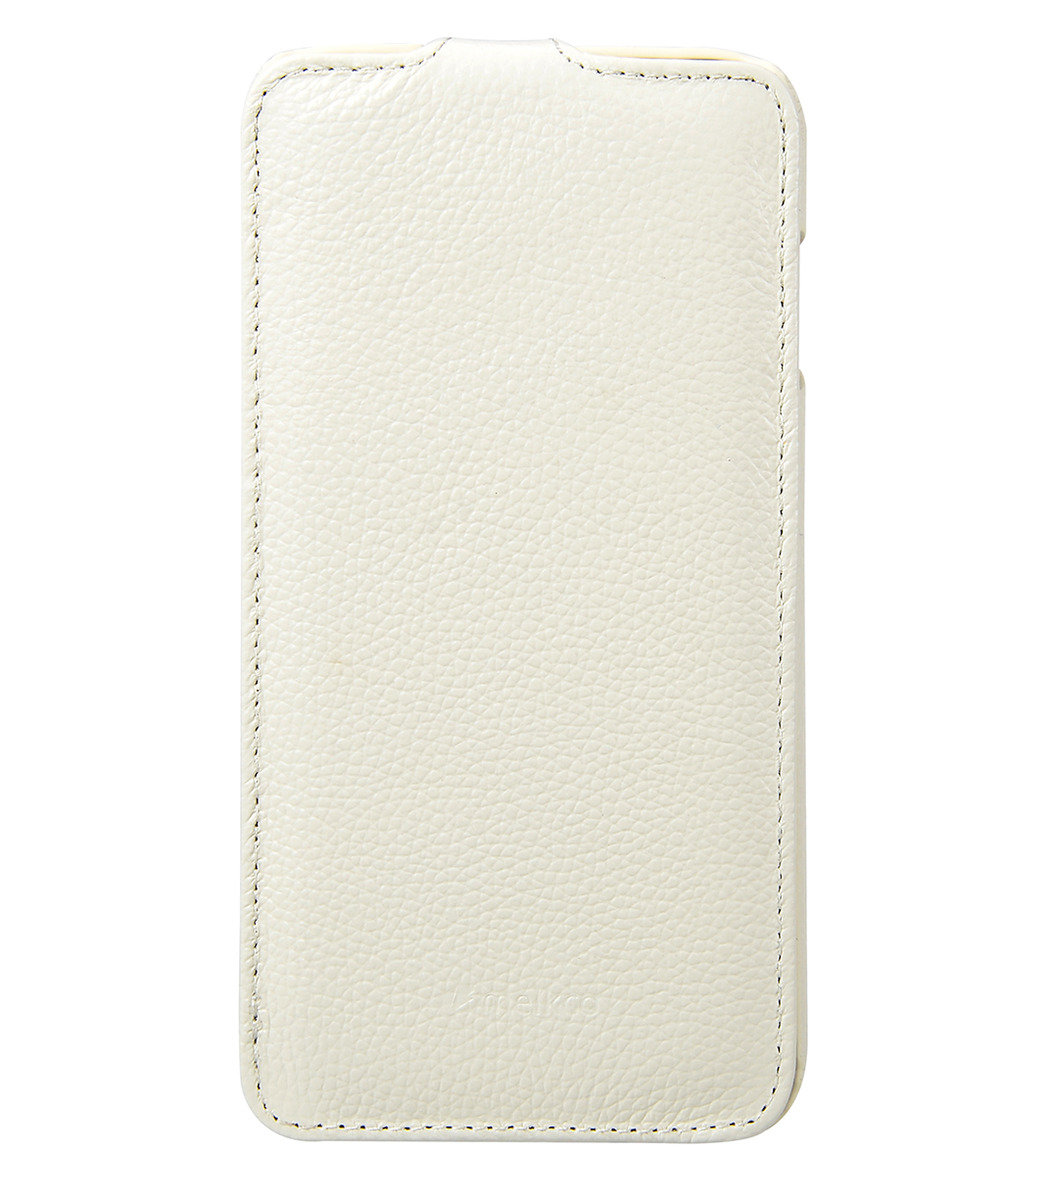 Apple iPhone 6 Plus/6s Plus  (5.5'') Jacka Type 高級真皮革手機套 (白色荔枝條紋)